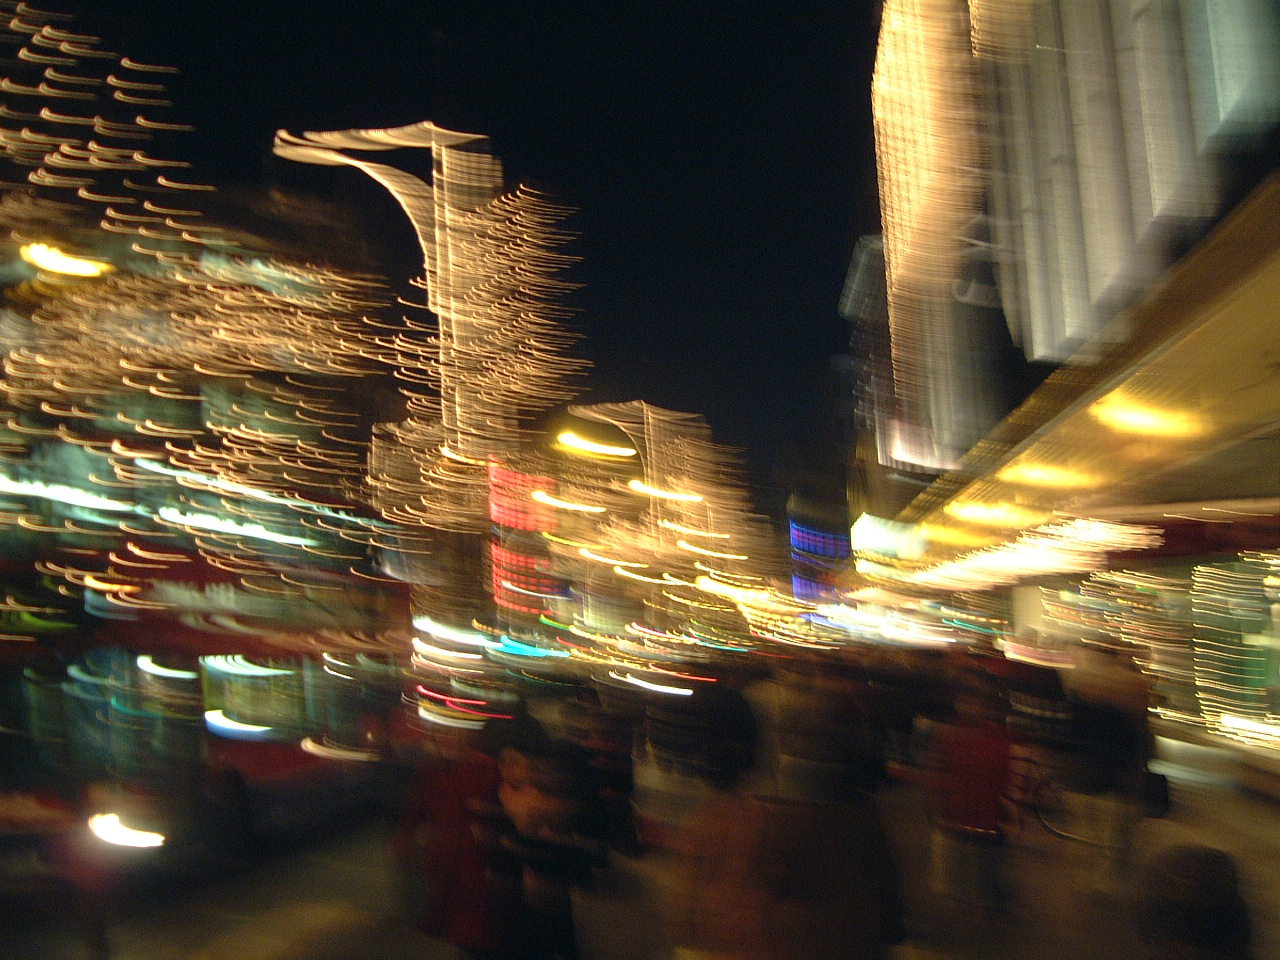 maartent night evening dark shopping center city lights christmas